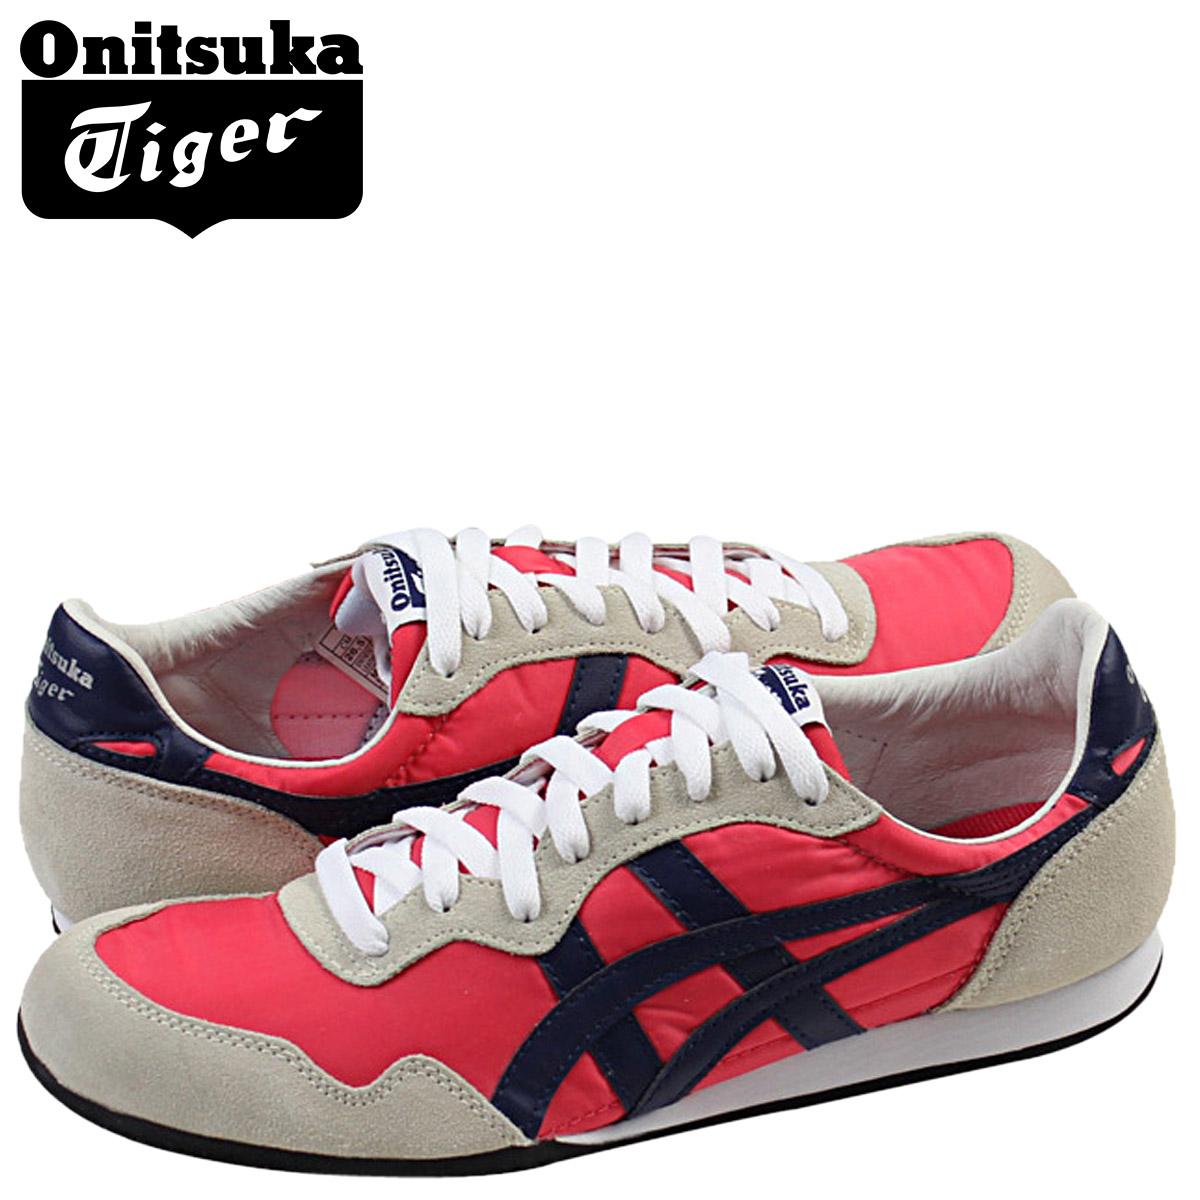 90637915eef5 SneaK Online Shop  Onitsuka Tiger ASICs Onitsuka Tiger asics SERRANO ...